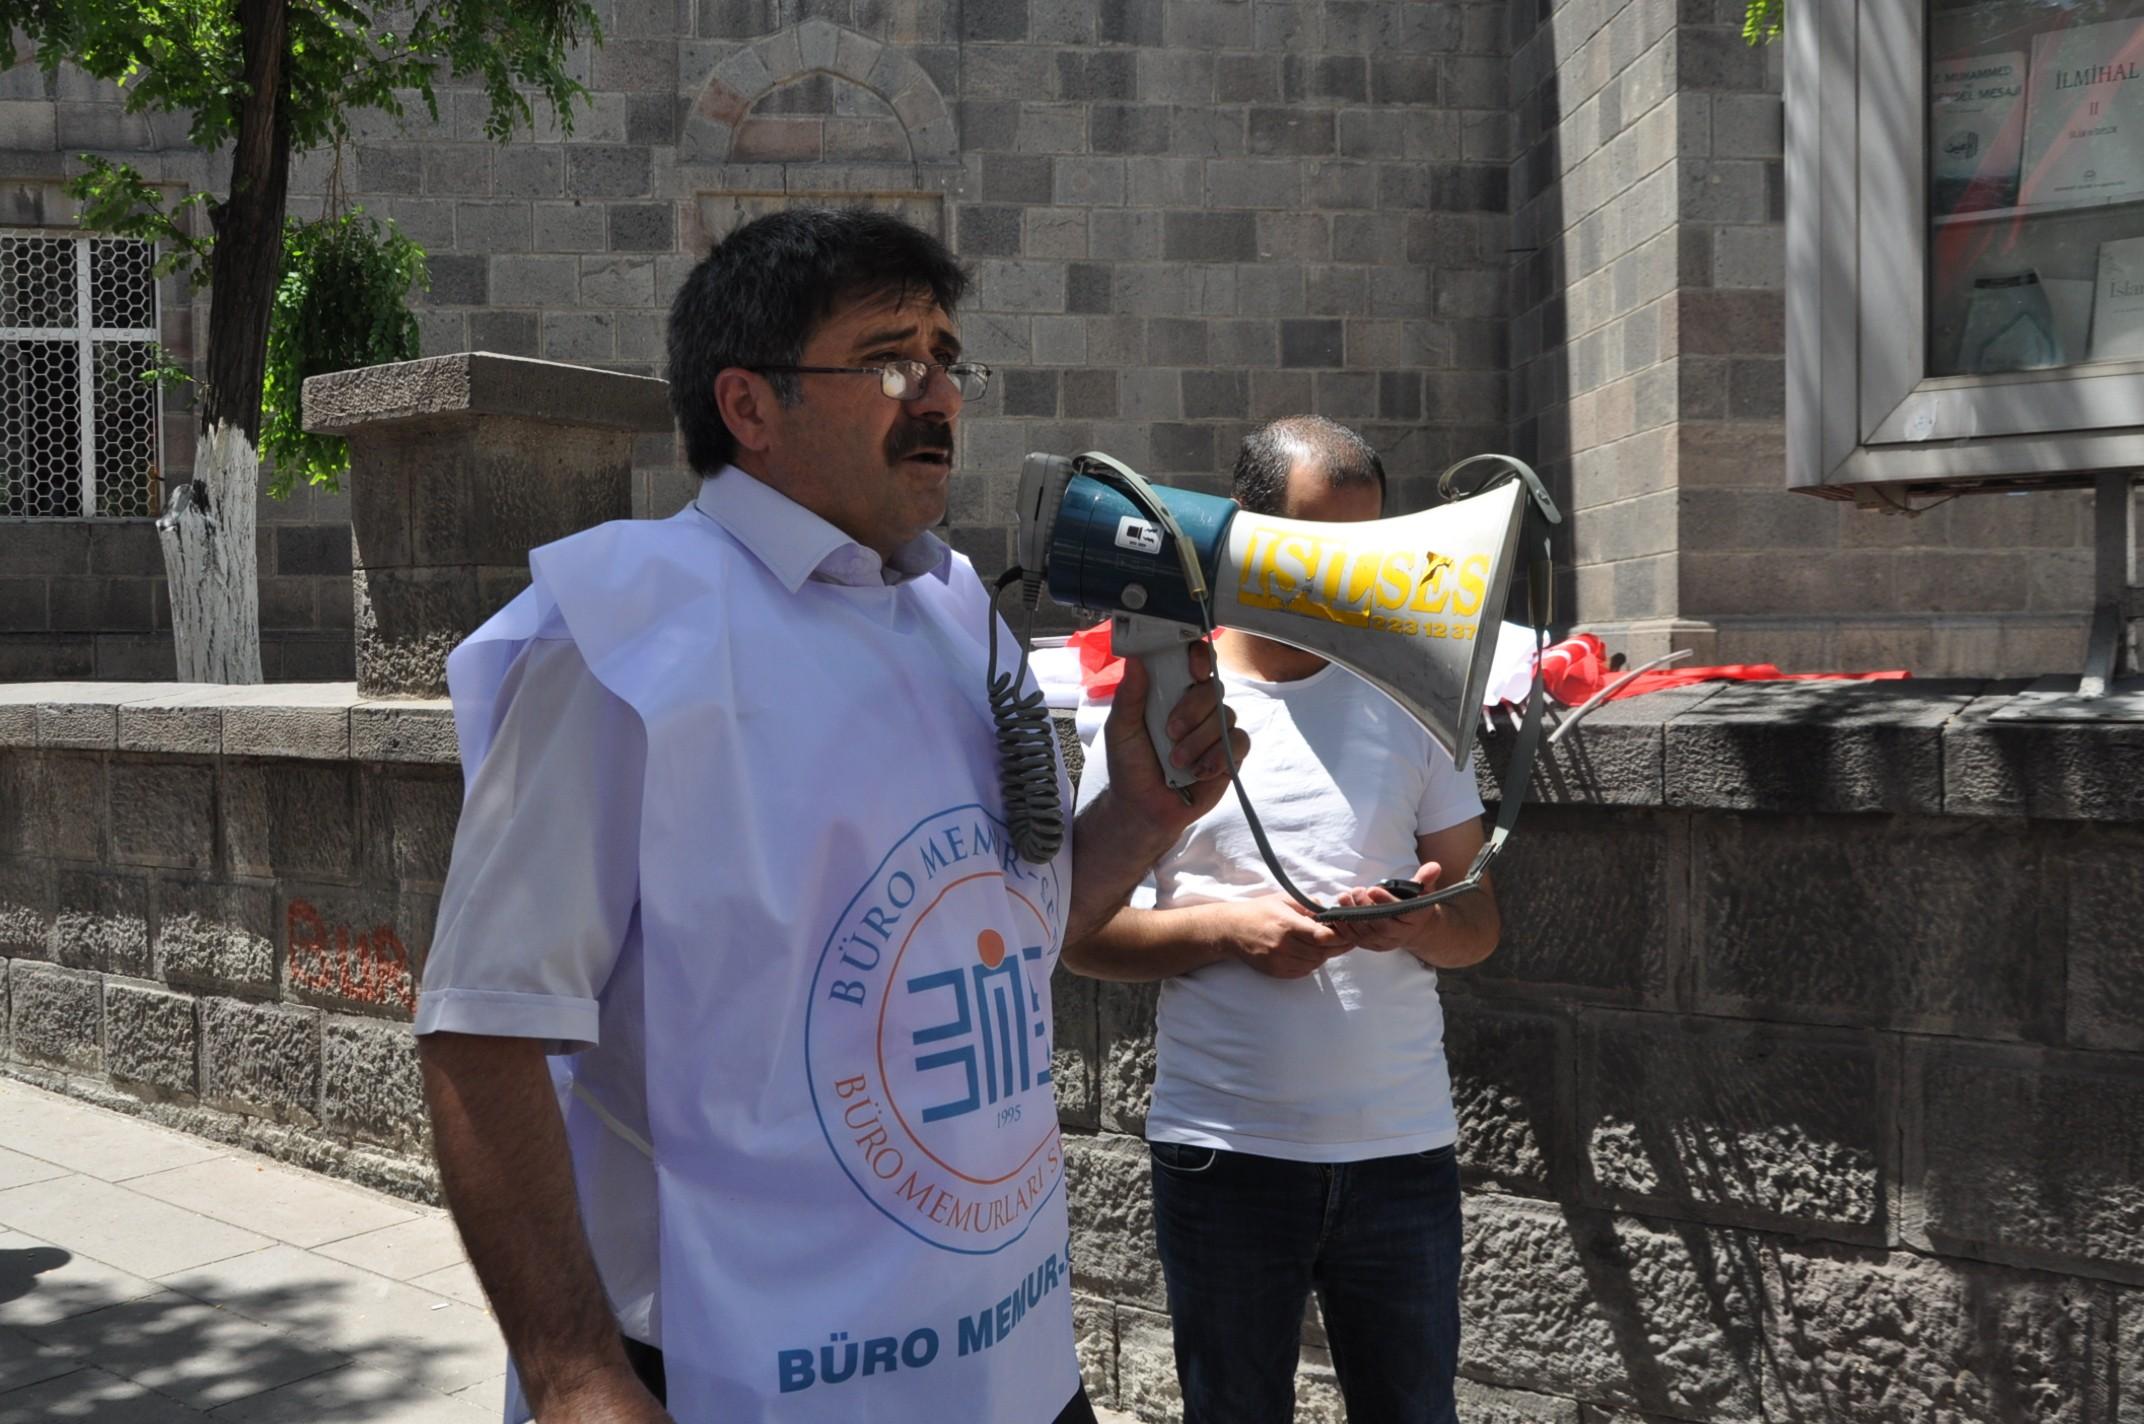 memur-sen-israili-protesto-etti-(2).jpg